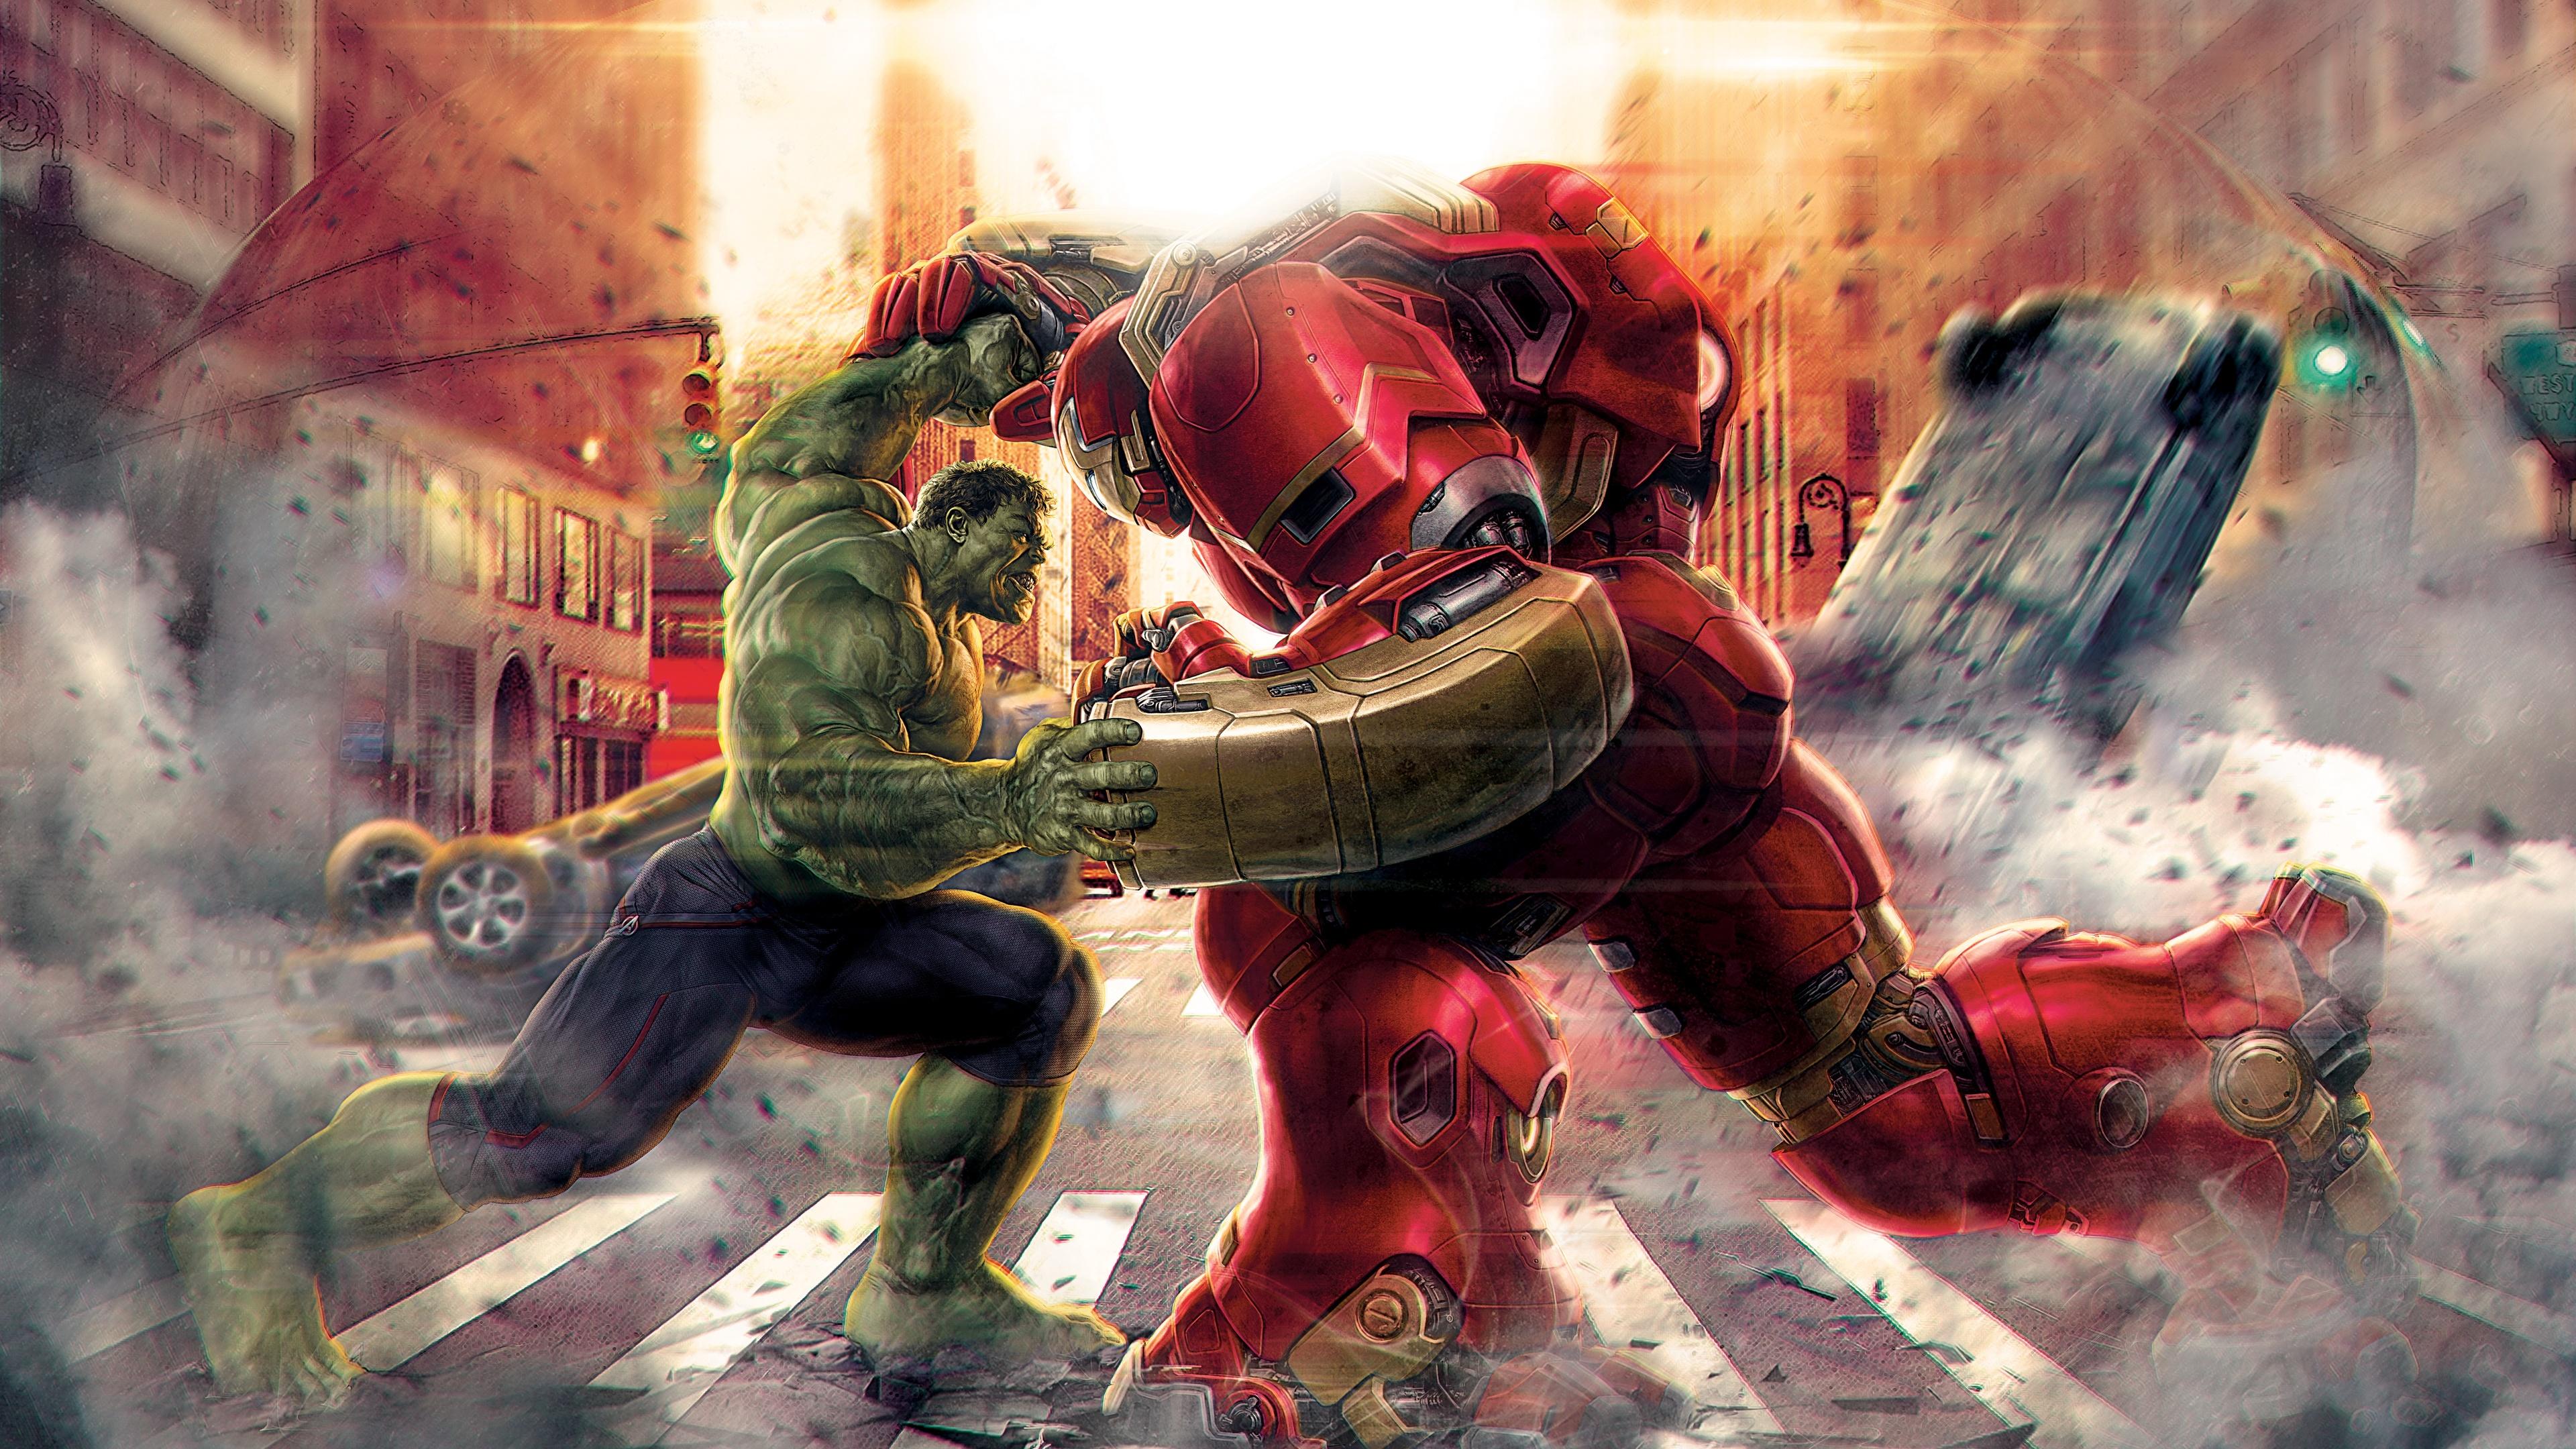 hulk vs iron hulkbuster artwork 1536522132 - Hulk Vs Iron Hulkbuster Artwork - hulk wallpapers, hd-wallpapers, digital art wallpapers, deviantart wallpapers, artwork wallpapers, artist wallpapers, 5k wallpapers, 4k-wallpapers